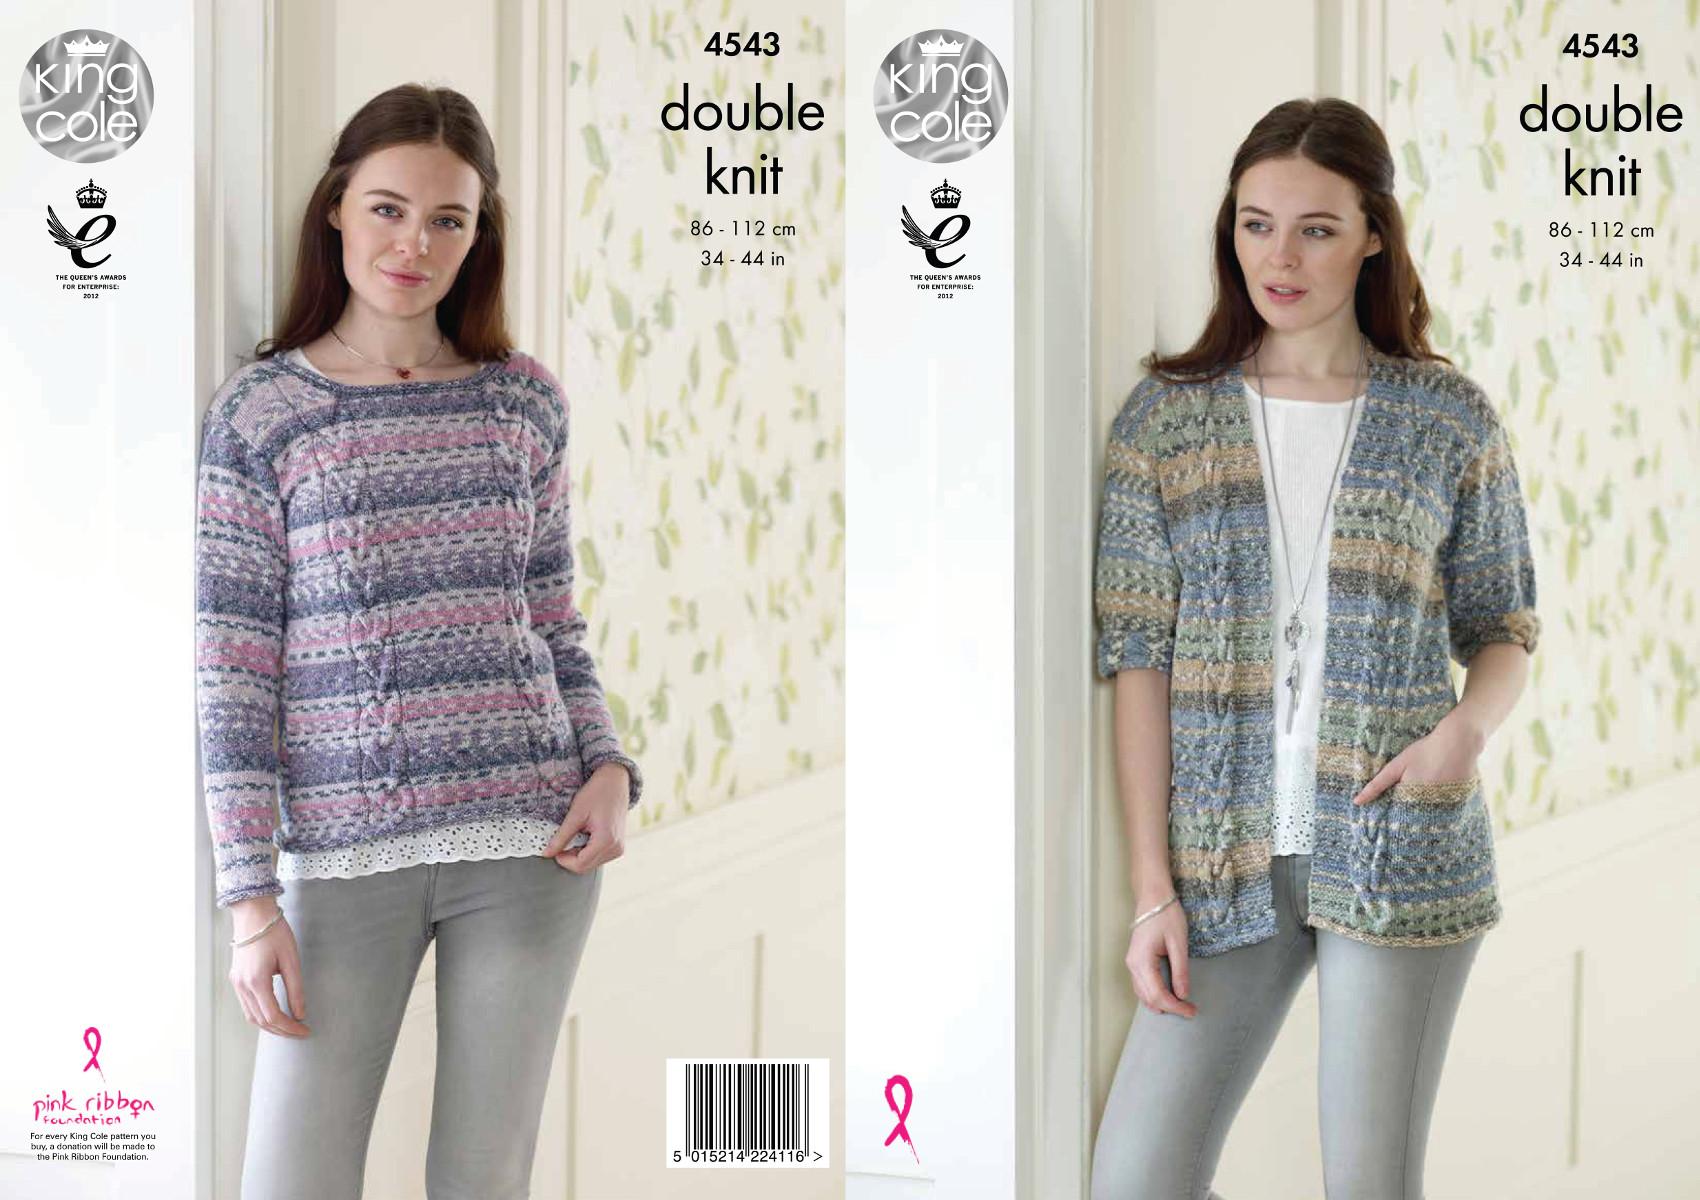 King Cole Ladies Cardigan Knitting Pattern : Ladies Cable Cardigan & Jumper Double Knitting Pattern King Cole Drifter ...